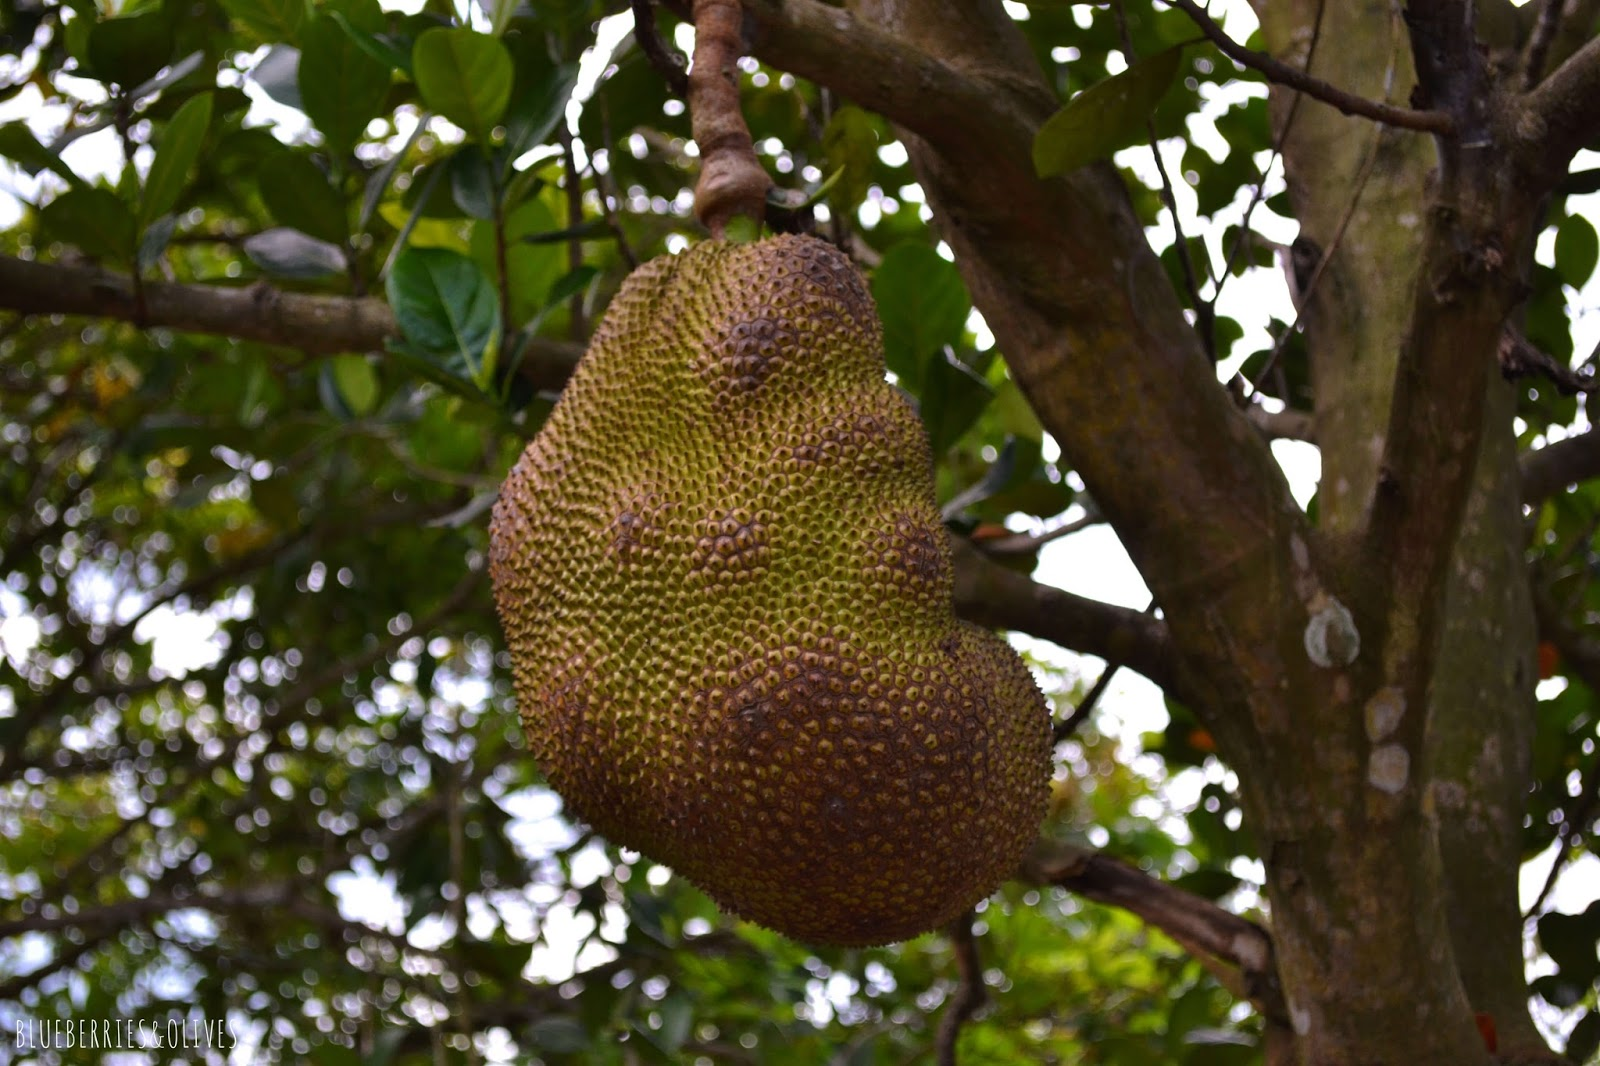 Jackfruit - Mekong Delta